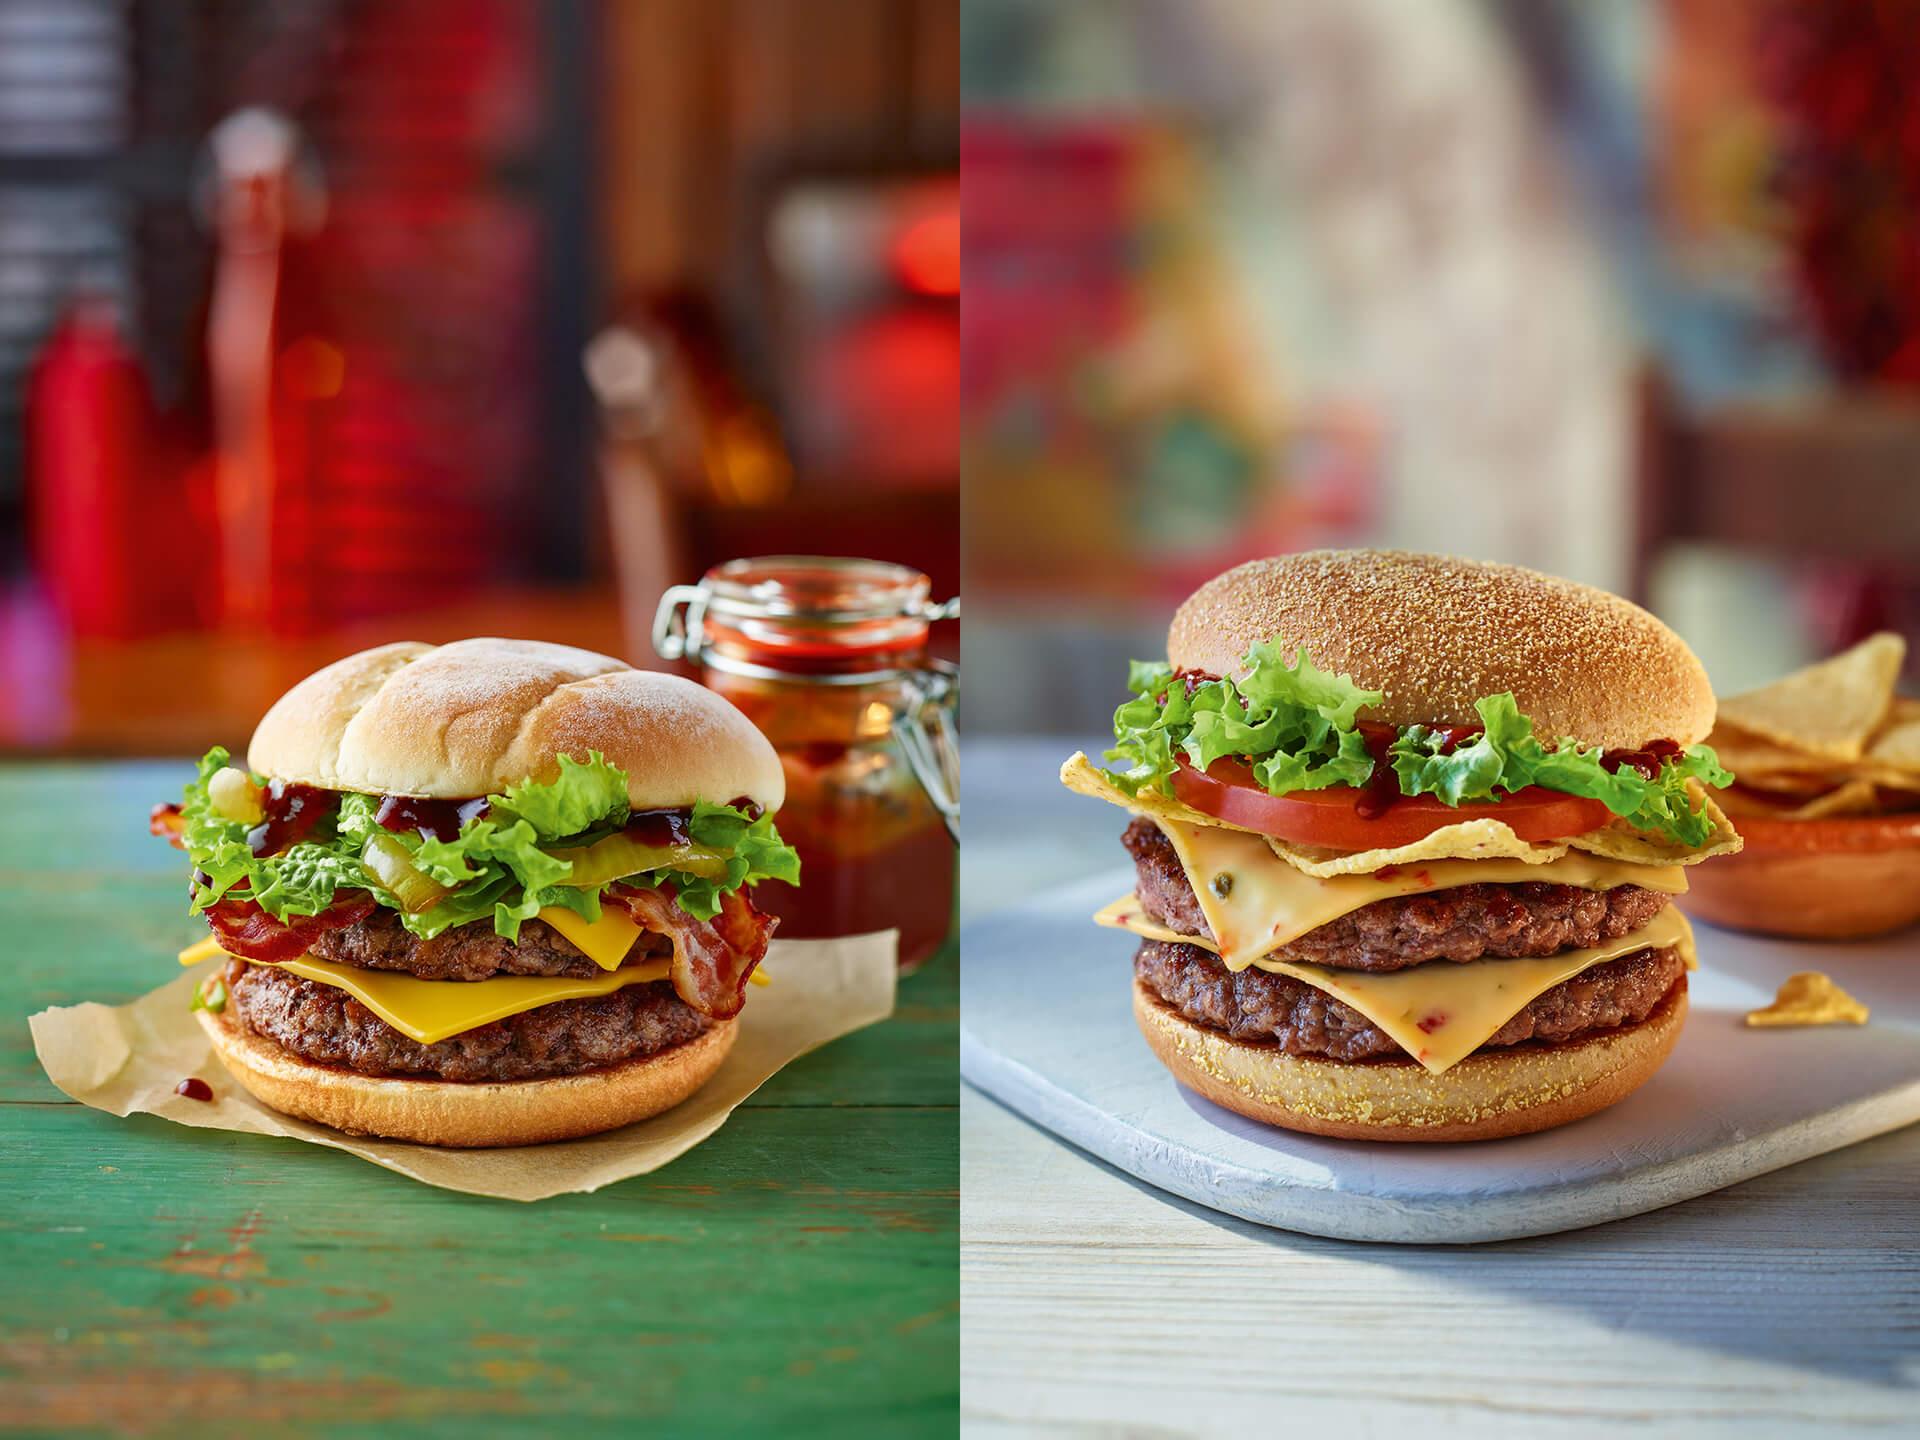 McDonalds Great Tastes of America 1920px 10